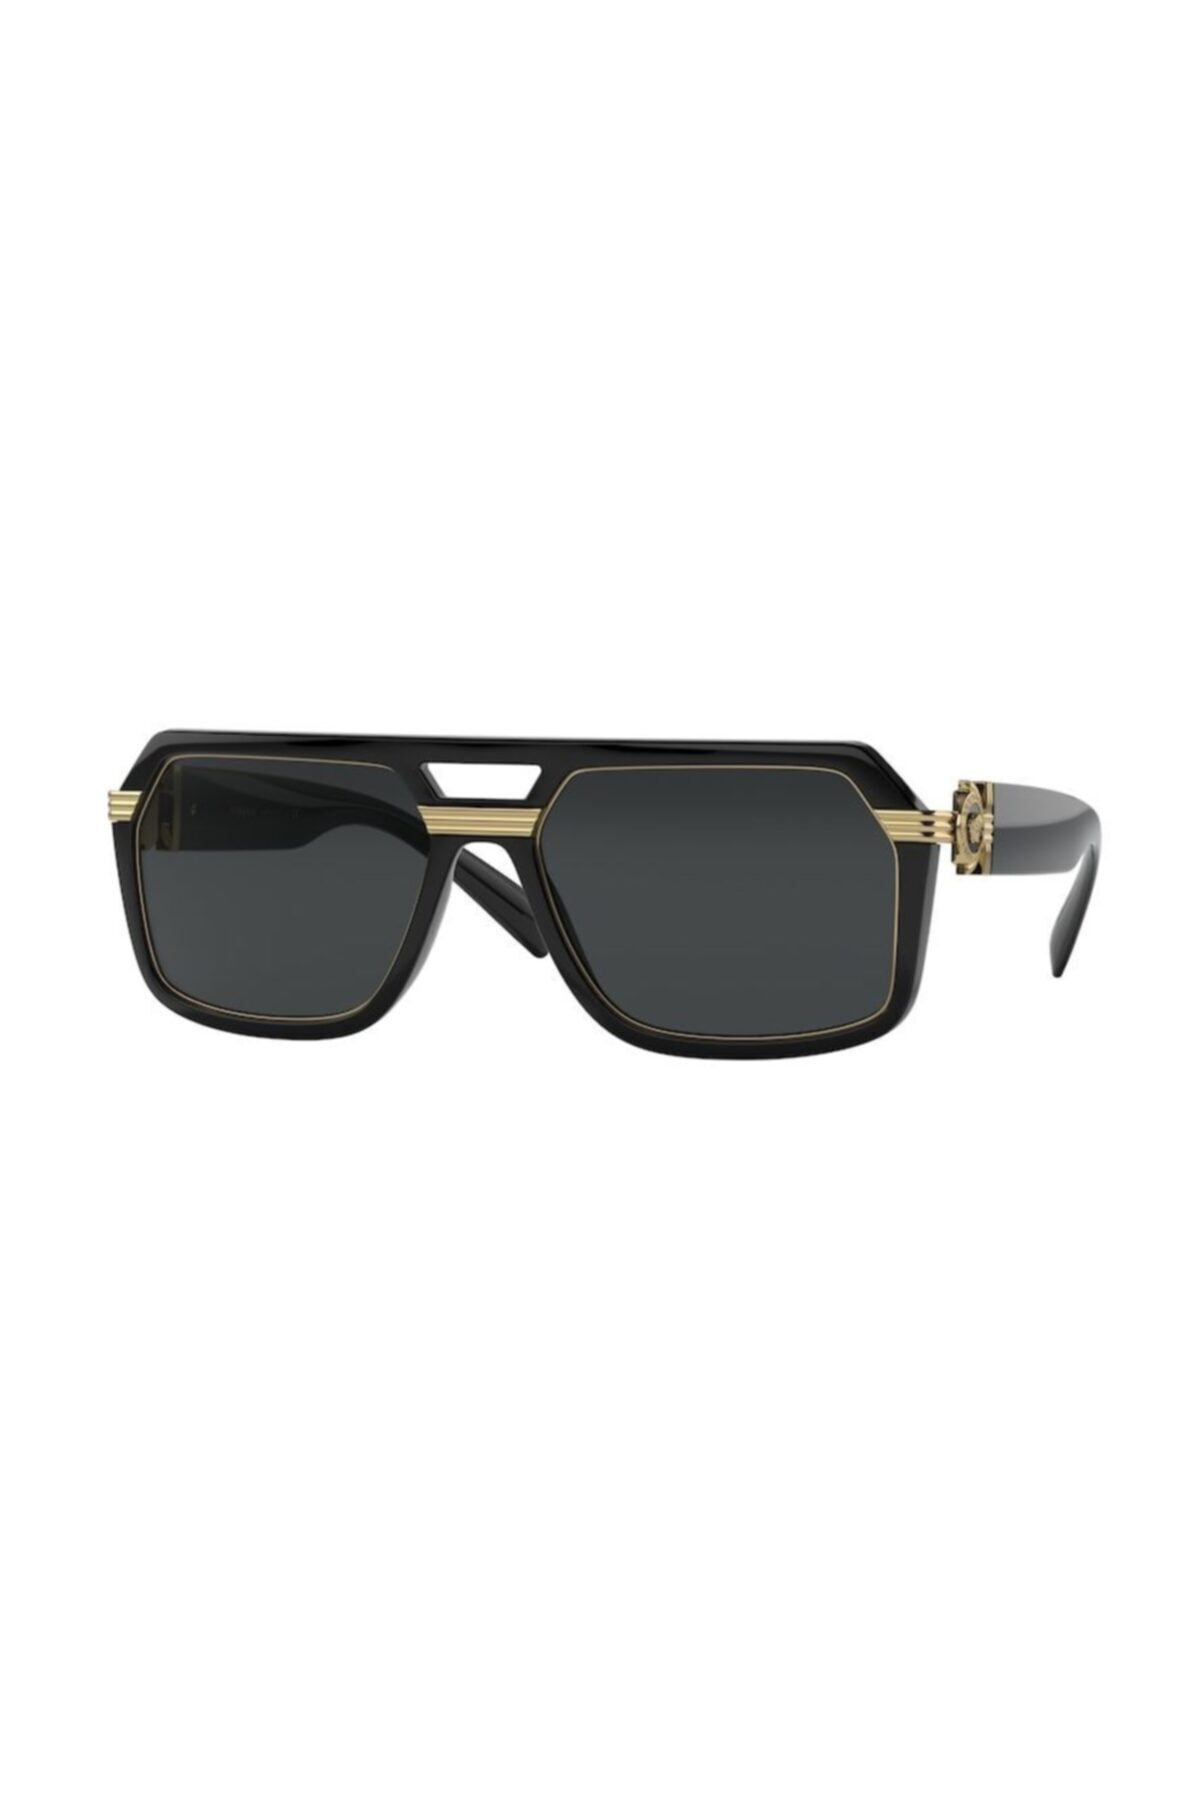 عینک دودی مردانه خفن برند ورساچ رنگ مشکی کد ty95277491